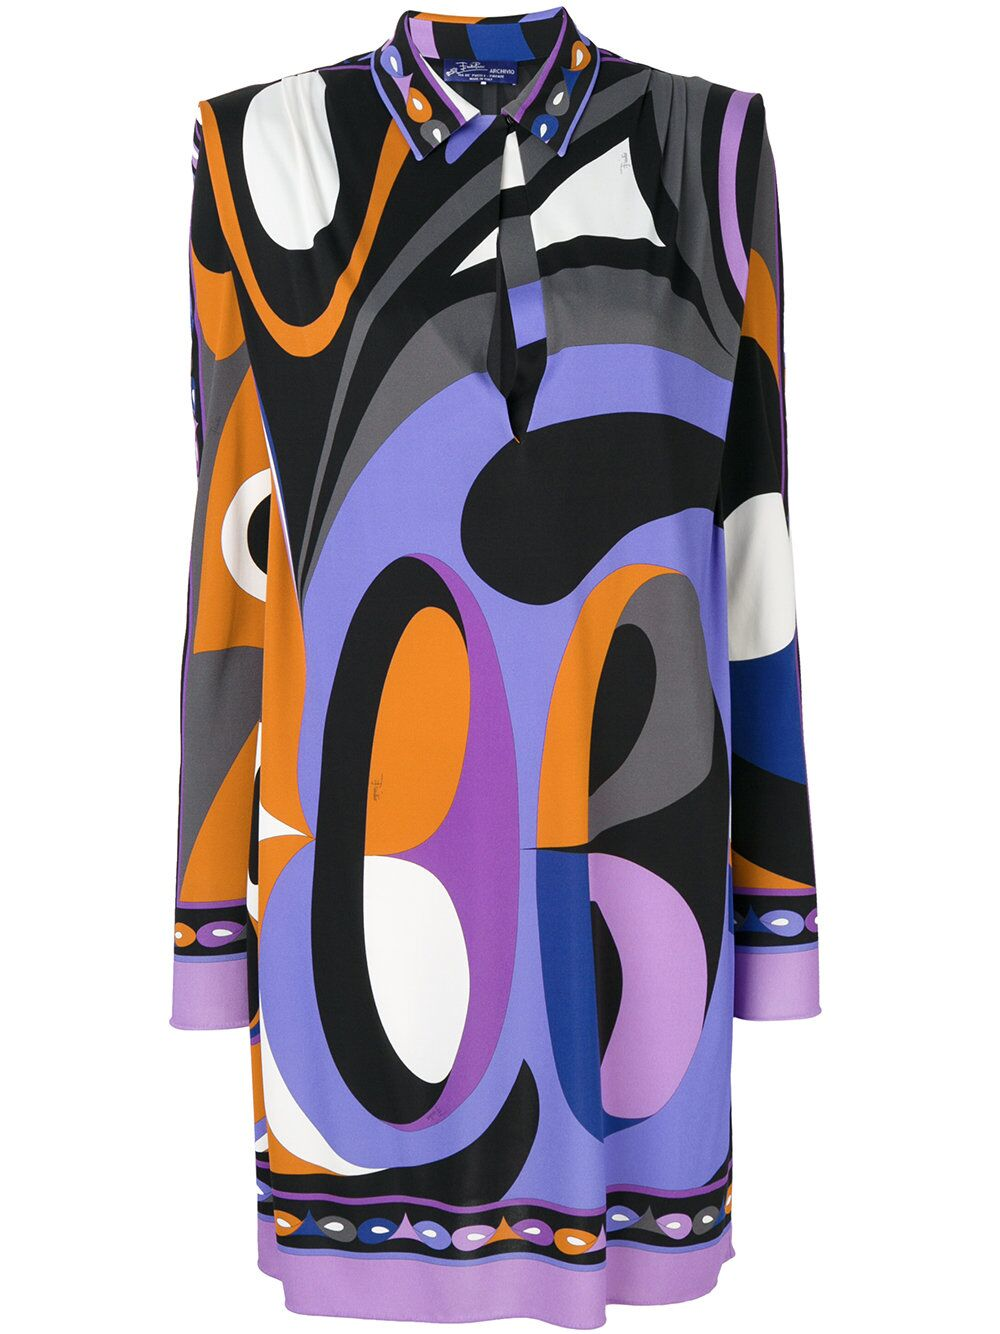 De nieuwe vrouwen mode Turn down Kraag zijde jersey stretch slim knit met riem jurk-in Jurken van Dames Kleding op  Groep 2